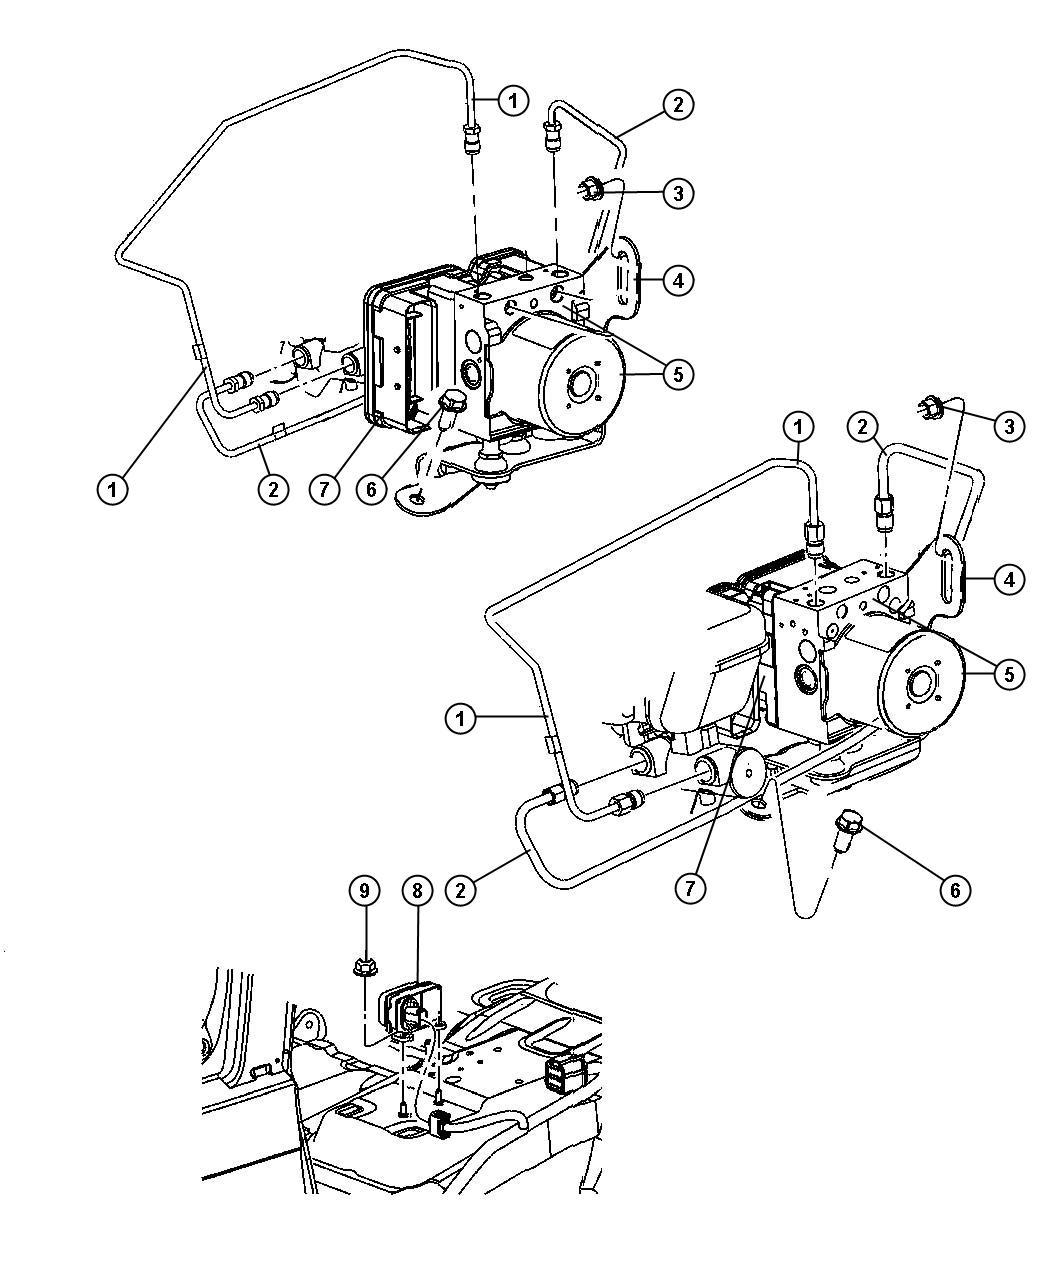 2009 Dodge Ram 3500 Screw. 6 lobe. M8x1.25x25.00. Mounting